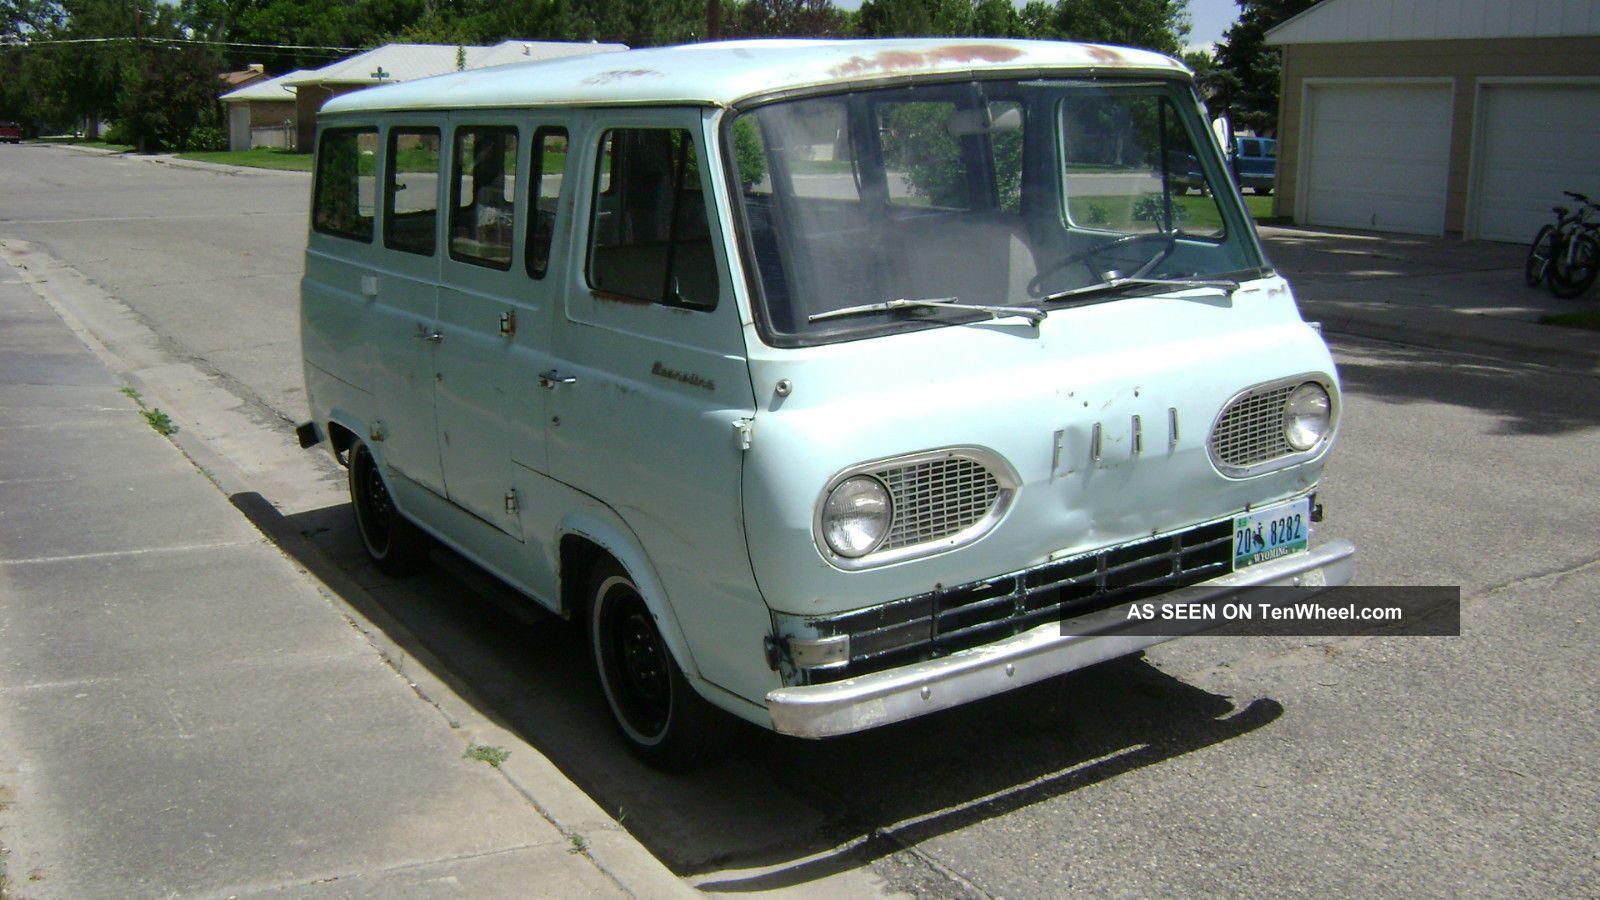 1961 Ford Econoline Van,  Runs,  Drives,  Stops,  Great Potential,  Dry Wyoming Van E-Series Van photo